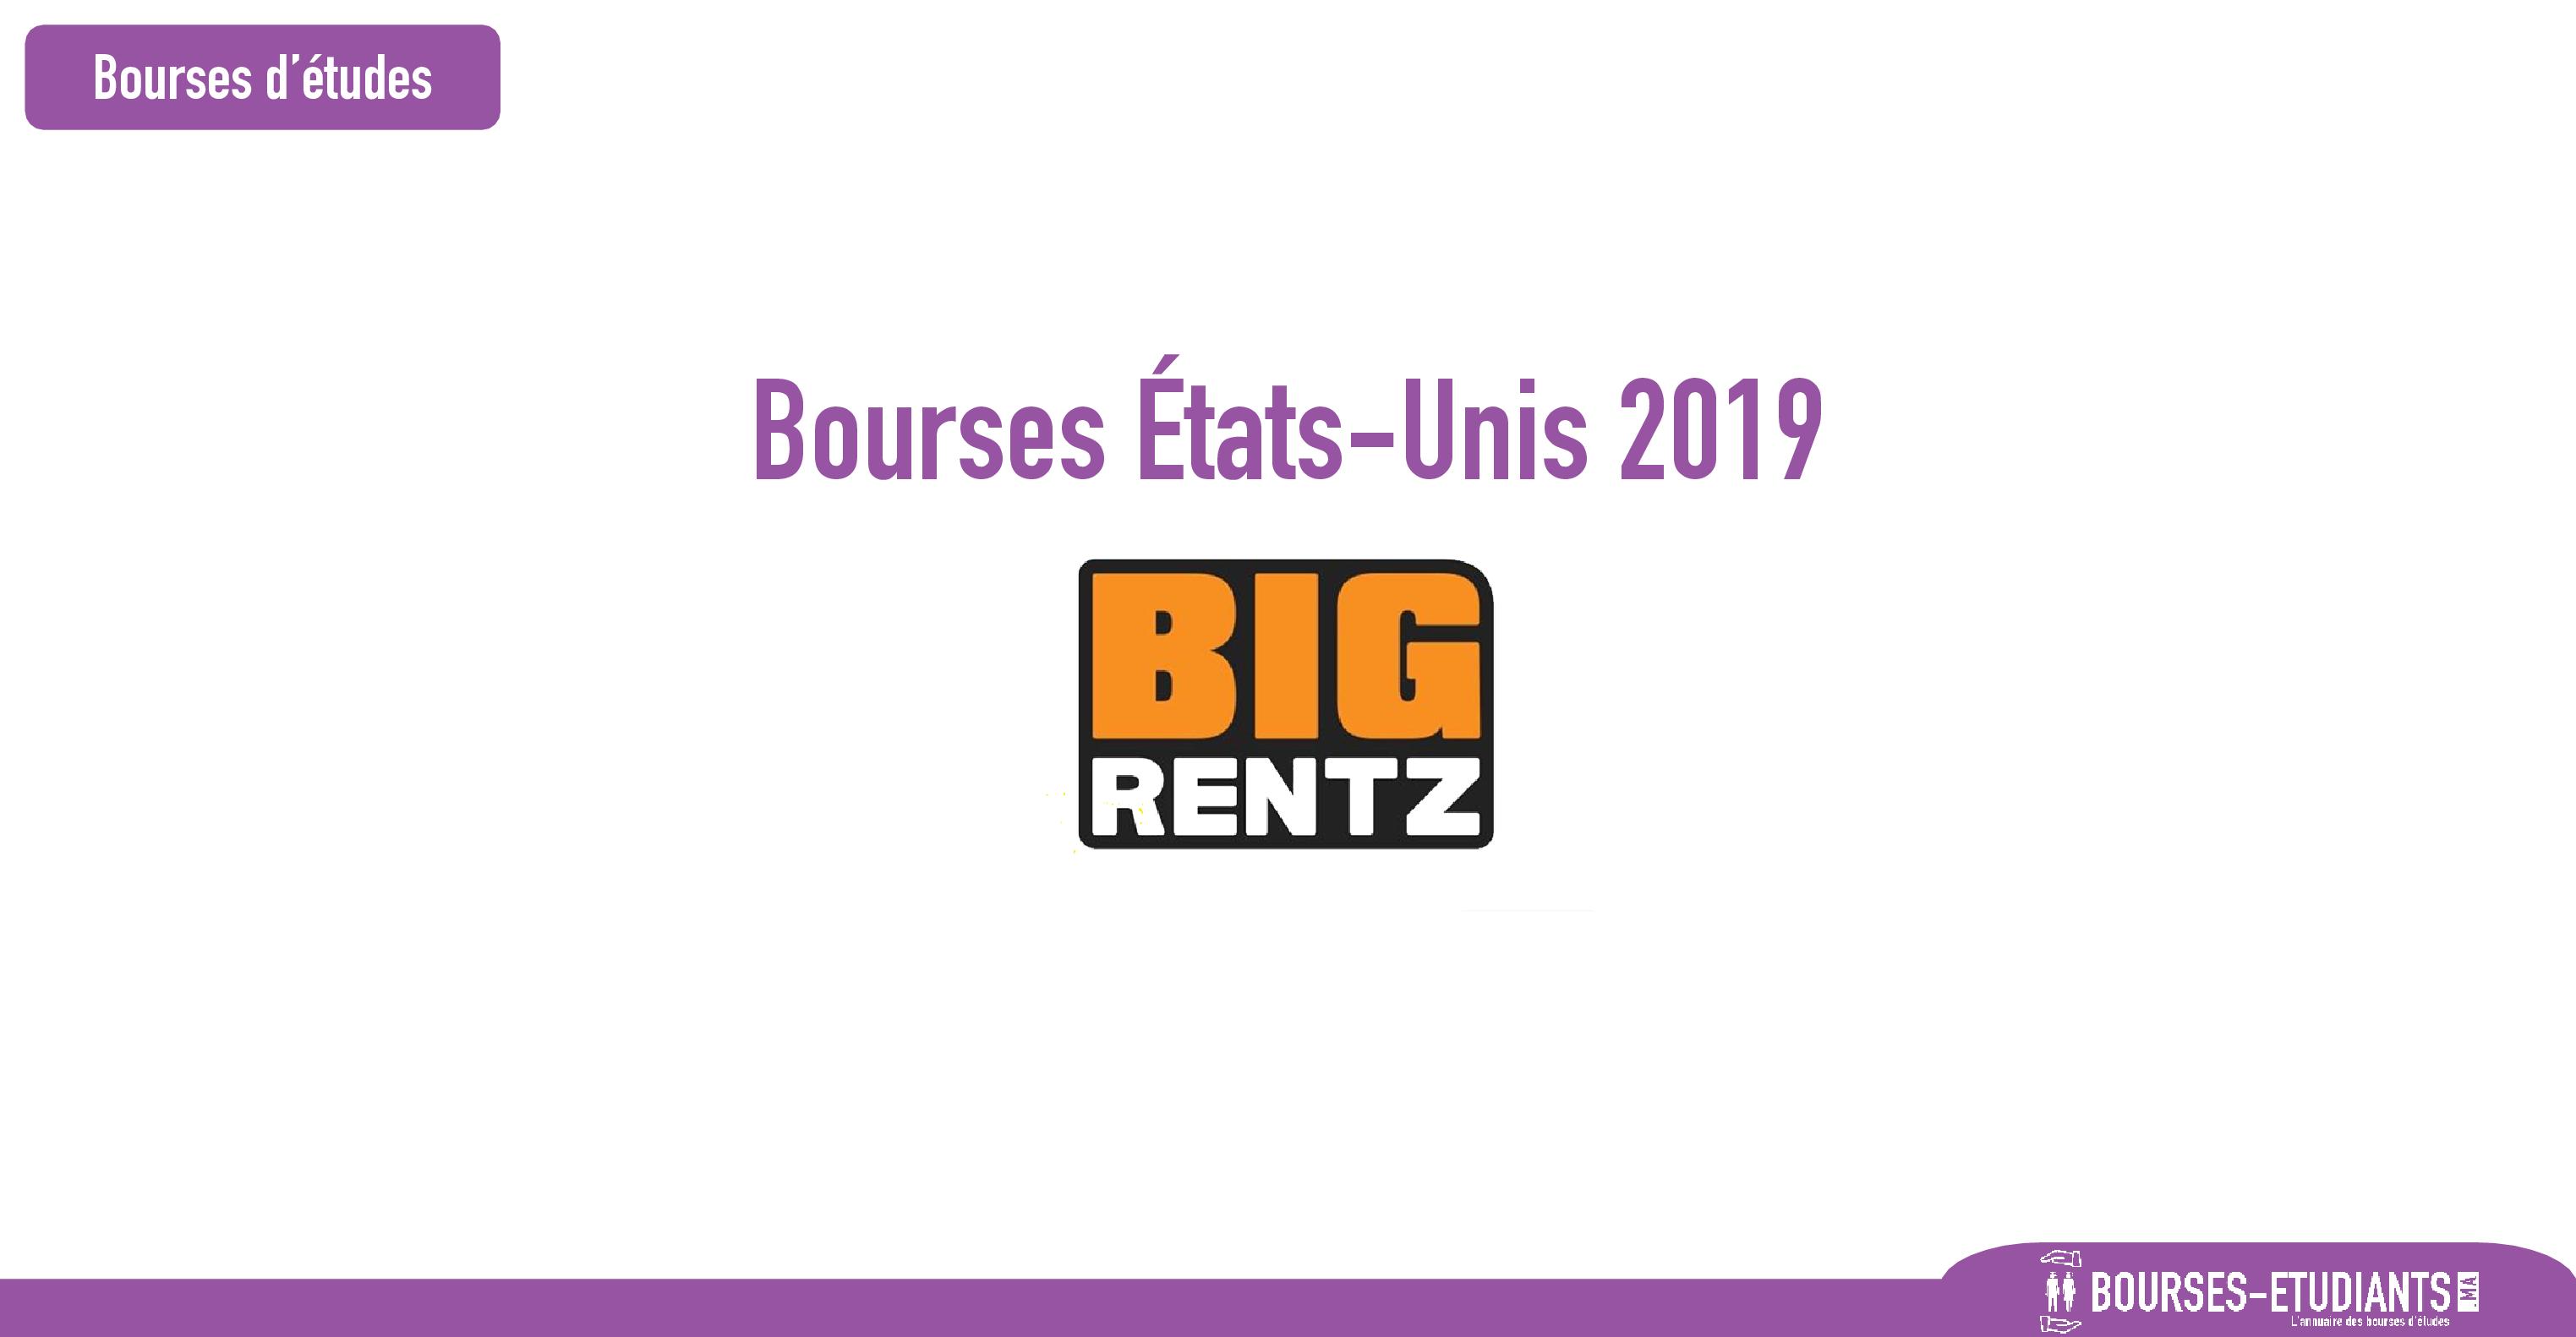 bourse big rentz